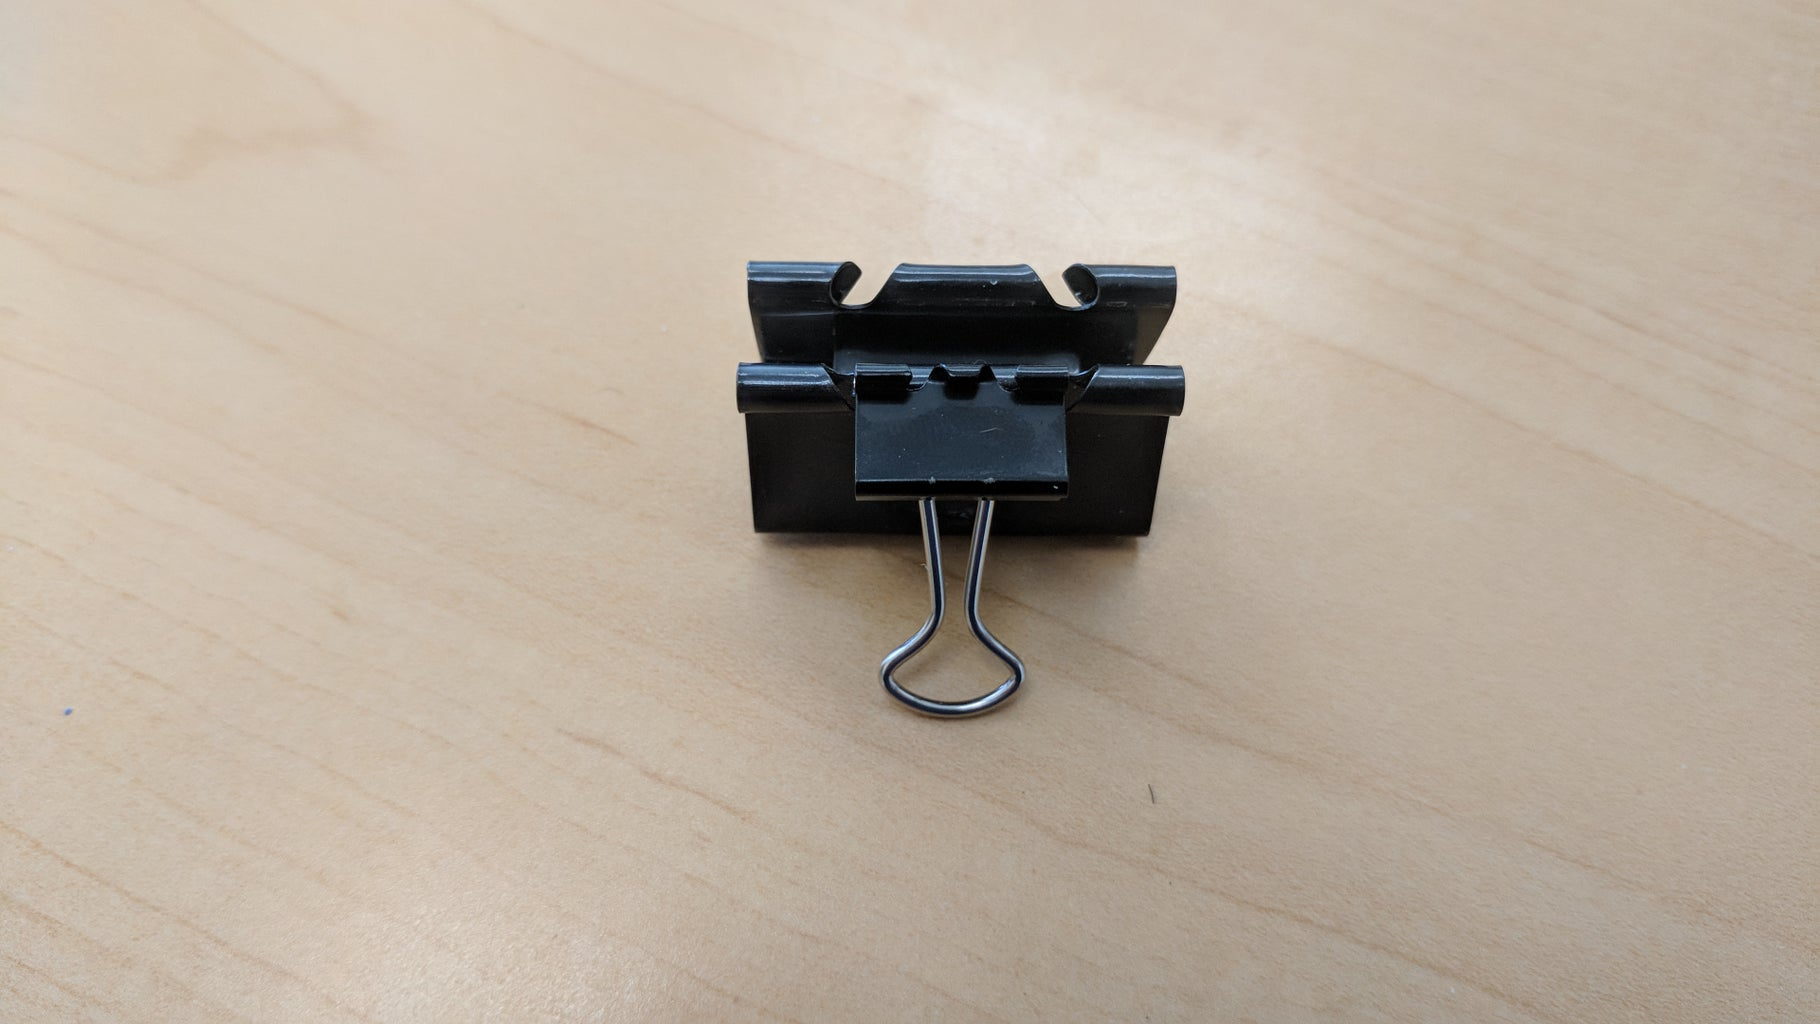 Clip Extra Small Binder Clip to the Medium Binder Clip